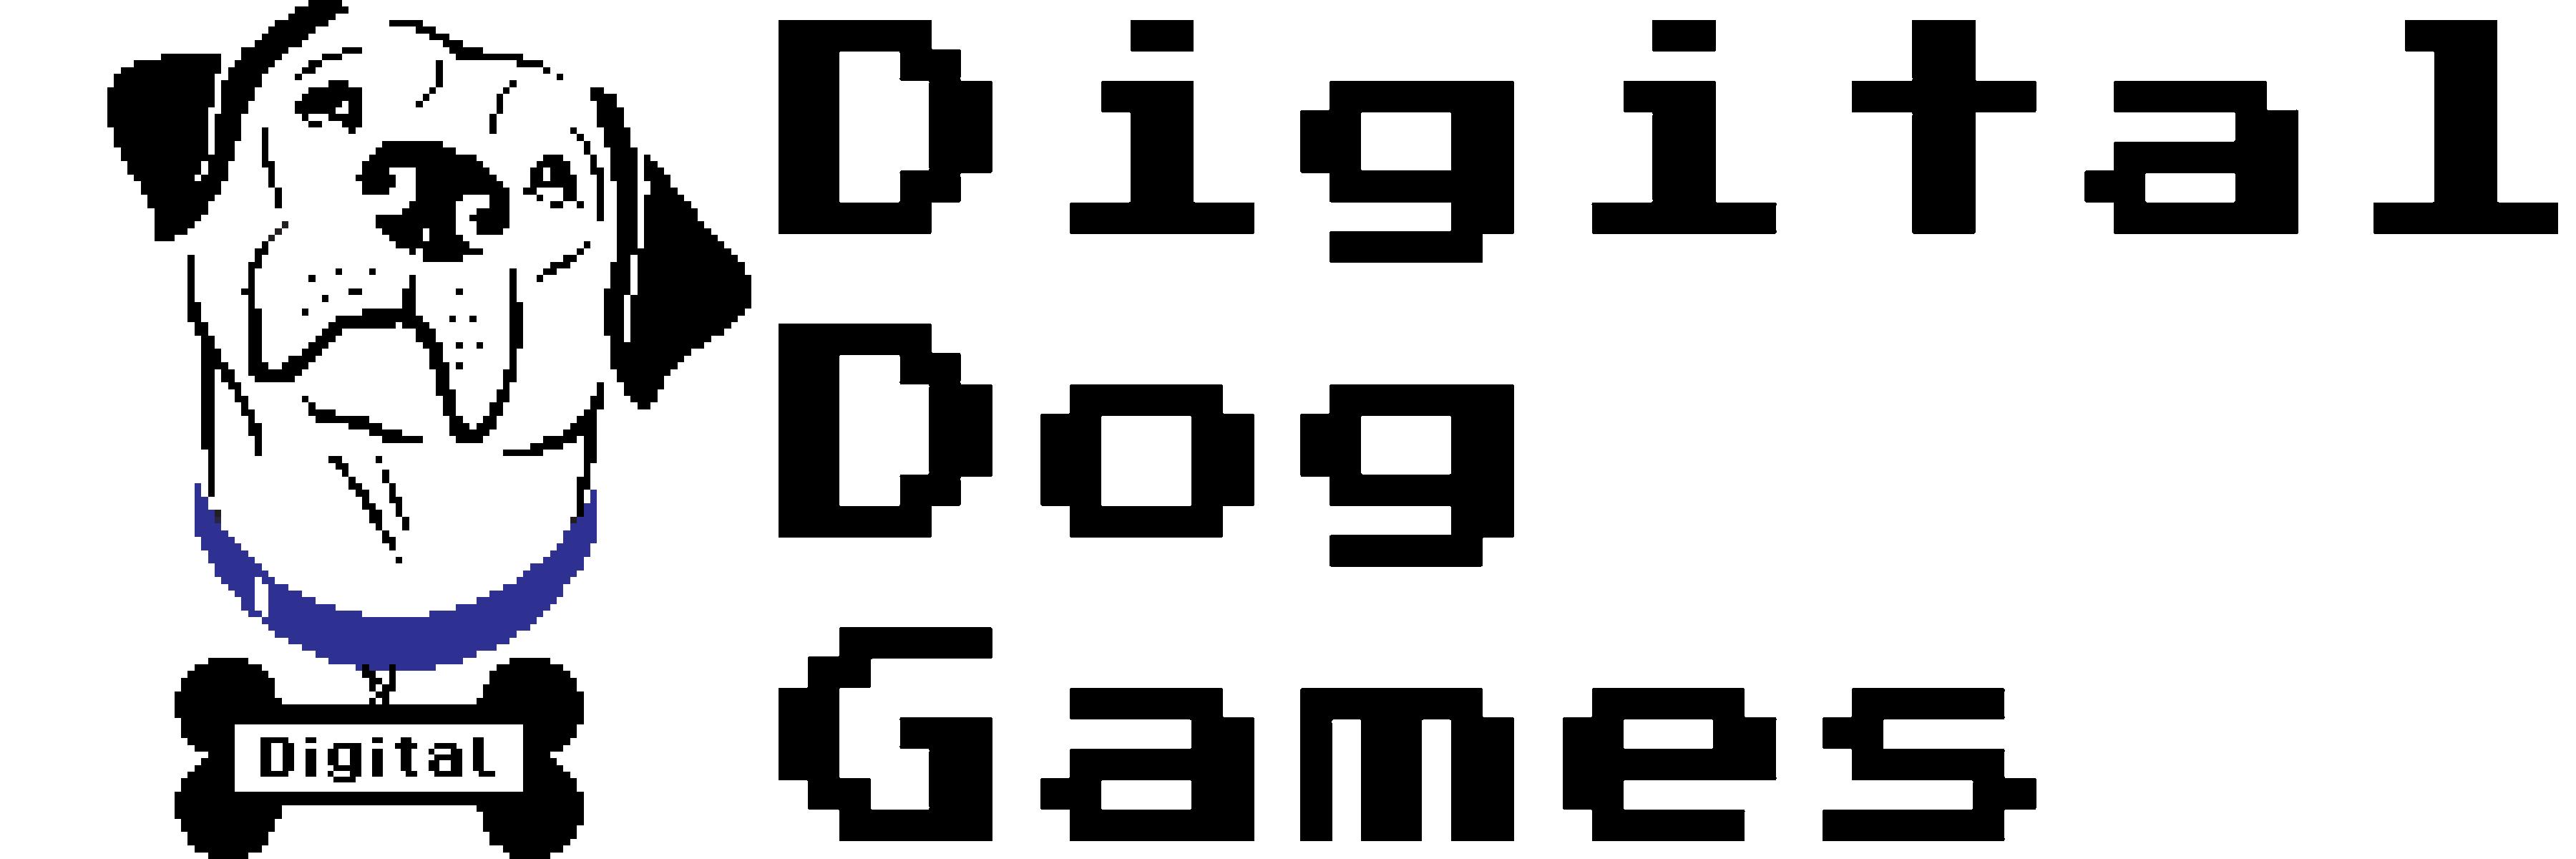 Digital Dog Games